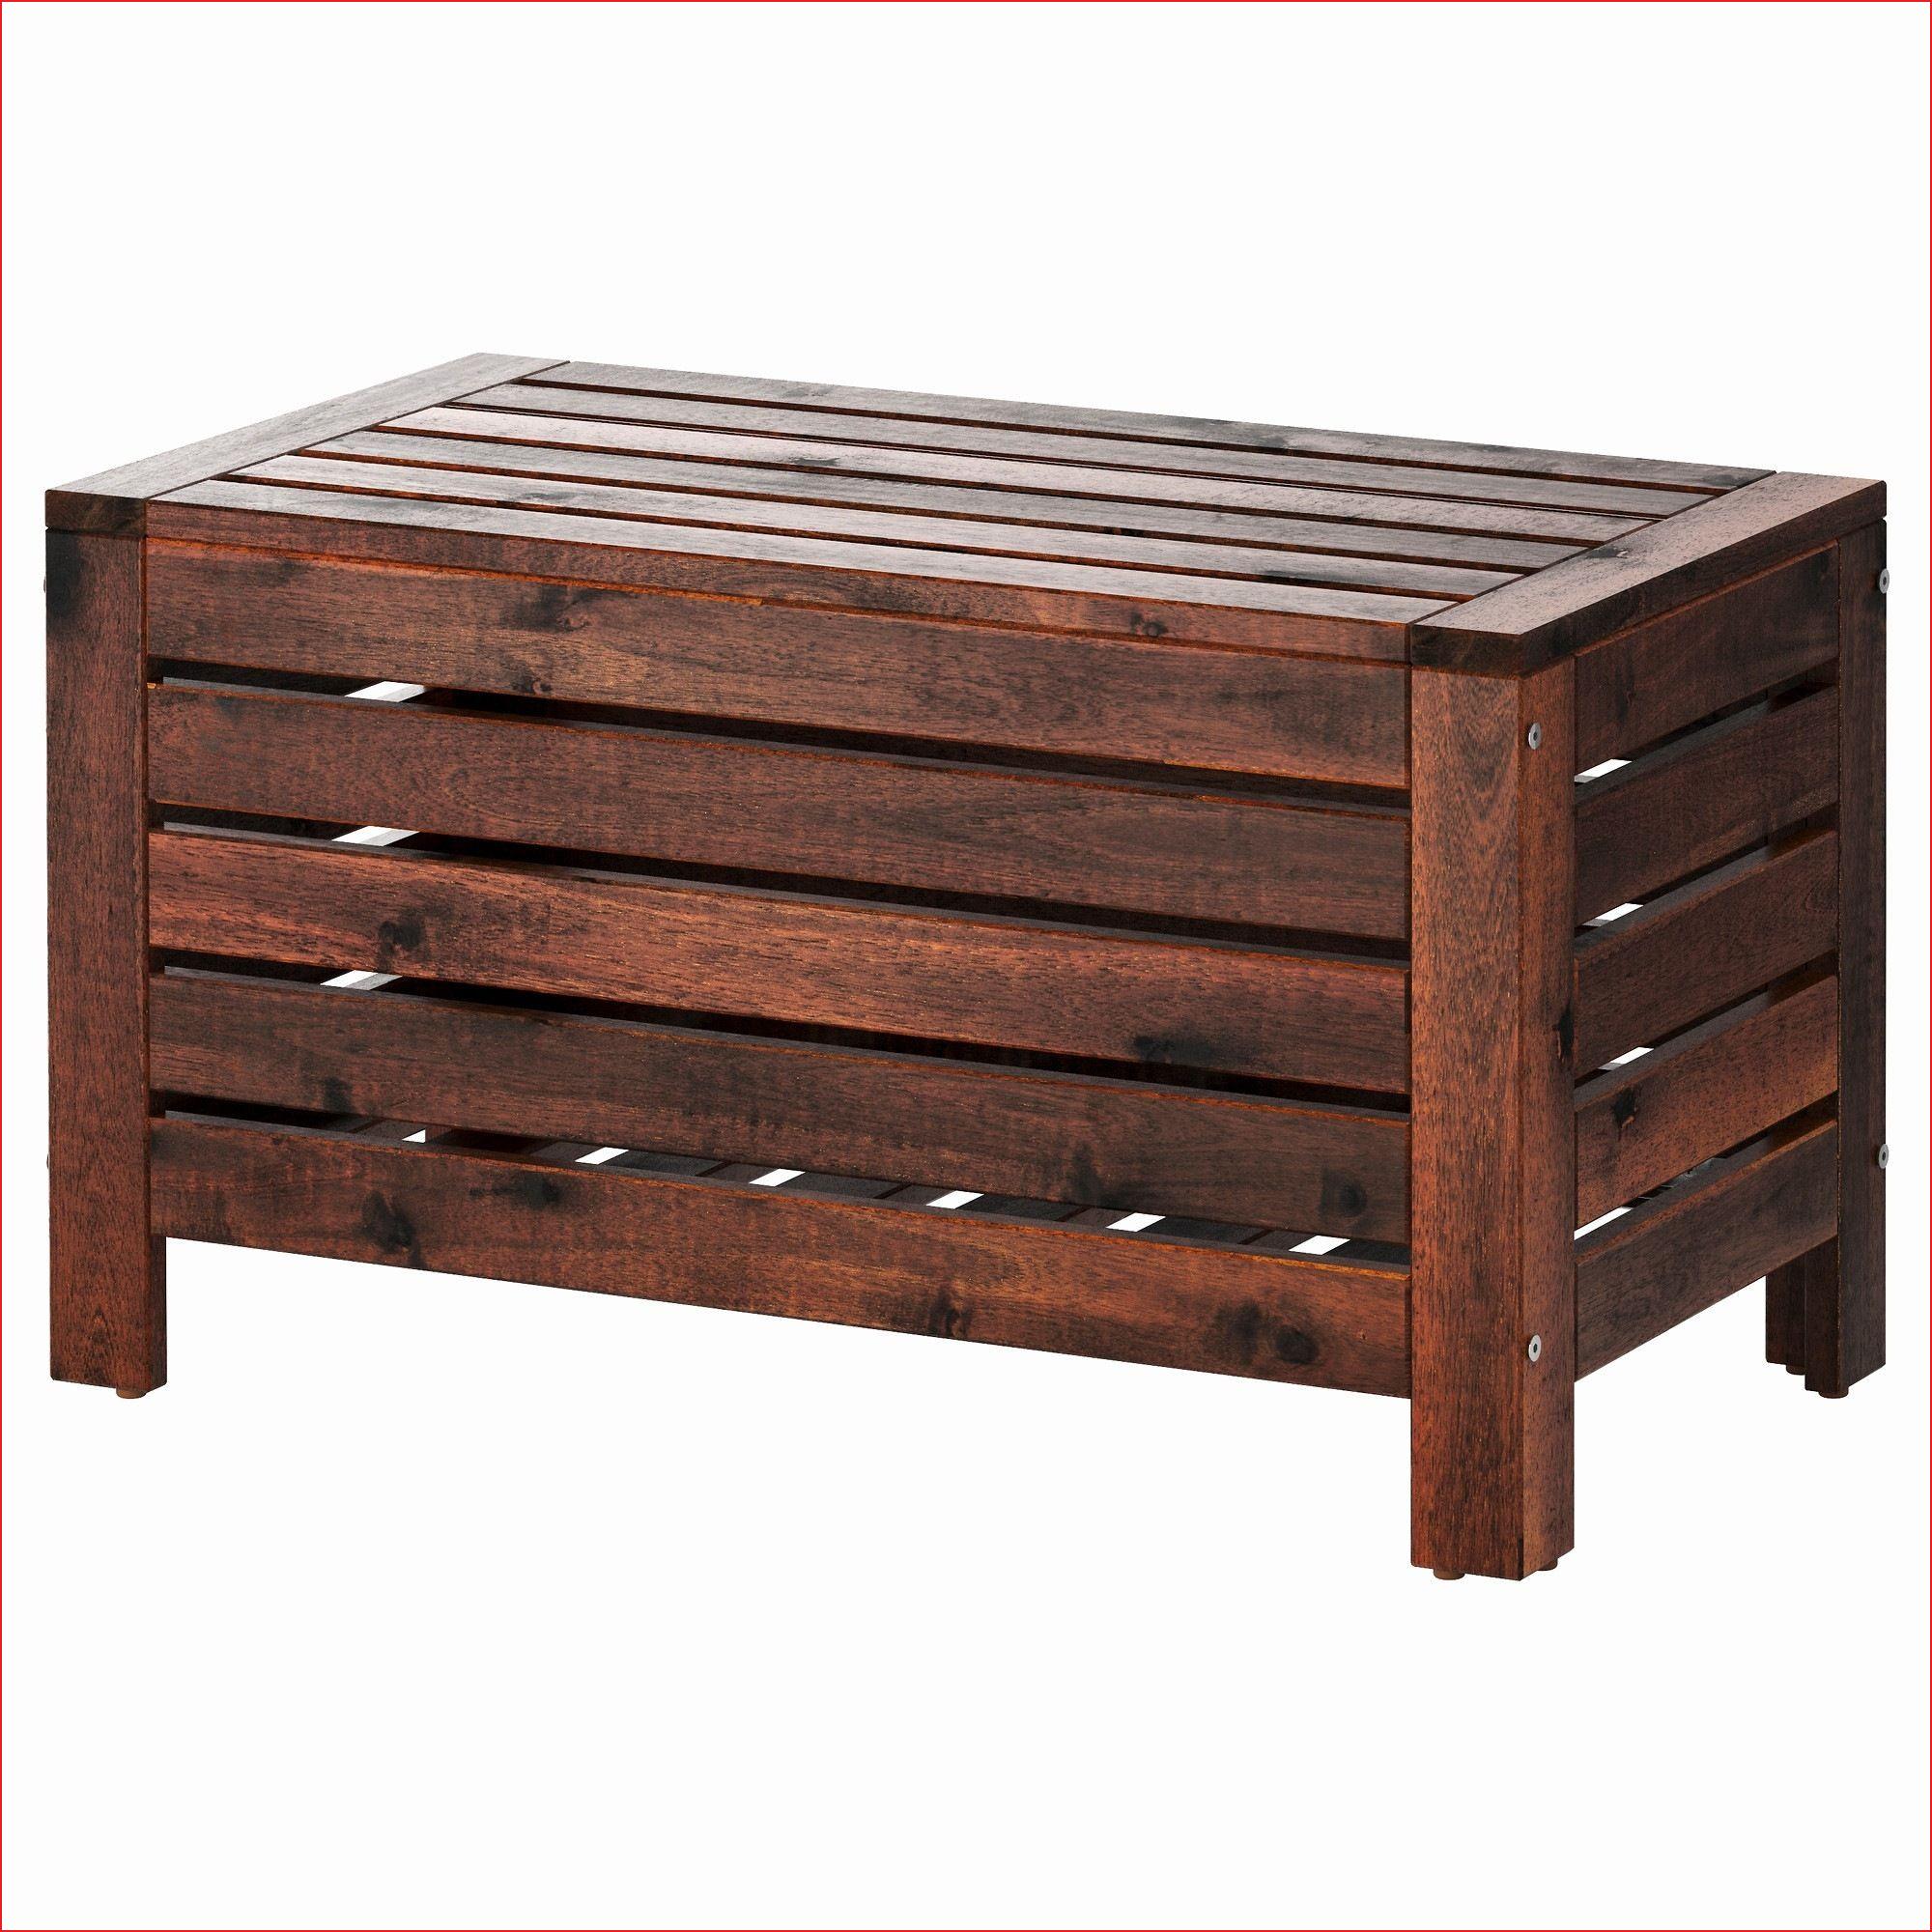 Prendre Un Coffre De Jardin Ikea Collection De Jardin Idée ... encequiconcerne Coffre De Jardin Brico Depot